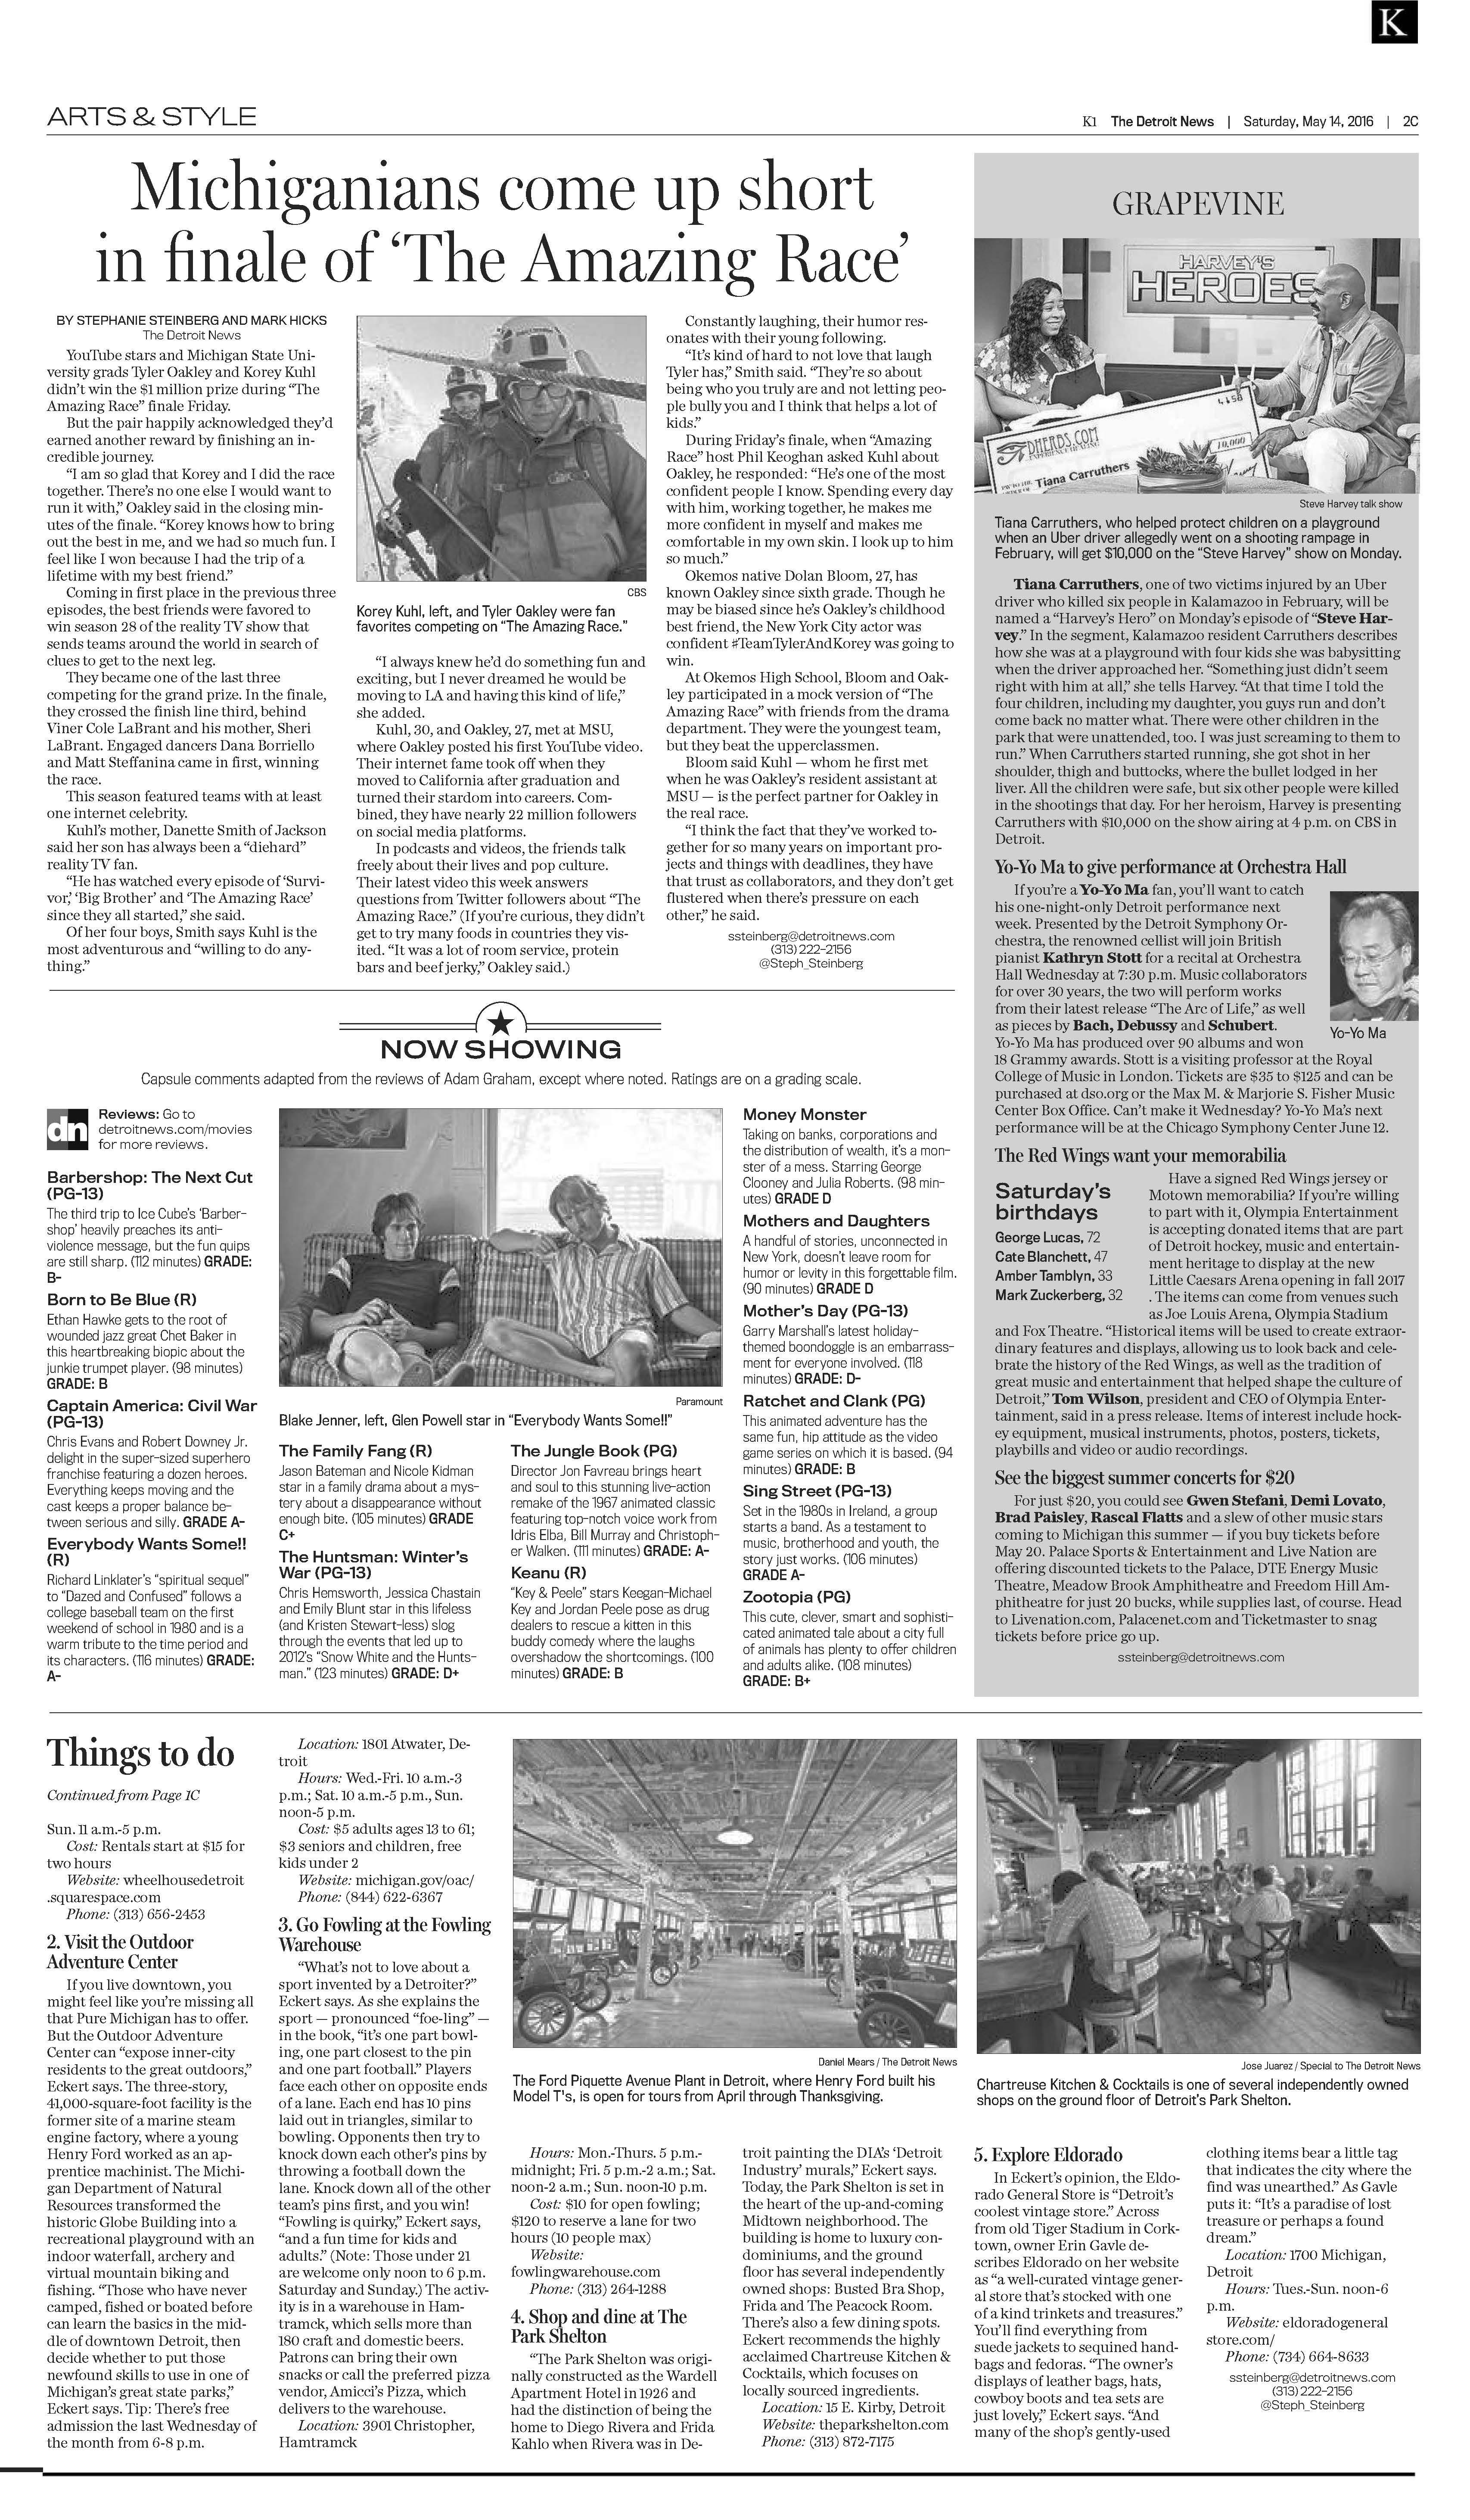 Detroit News 2